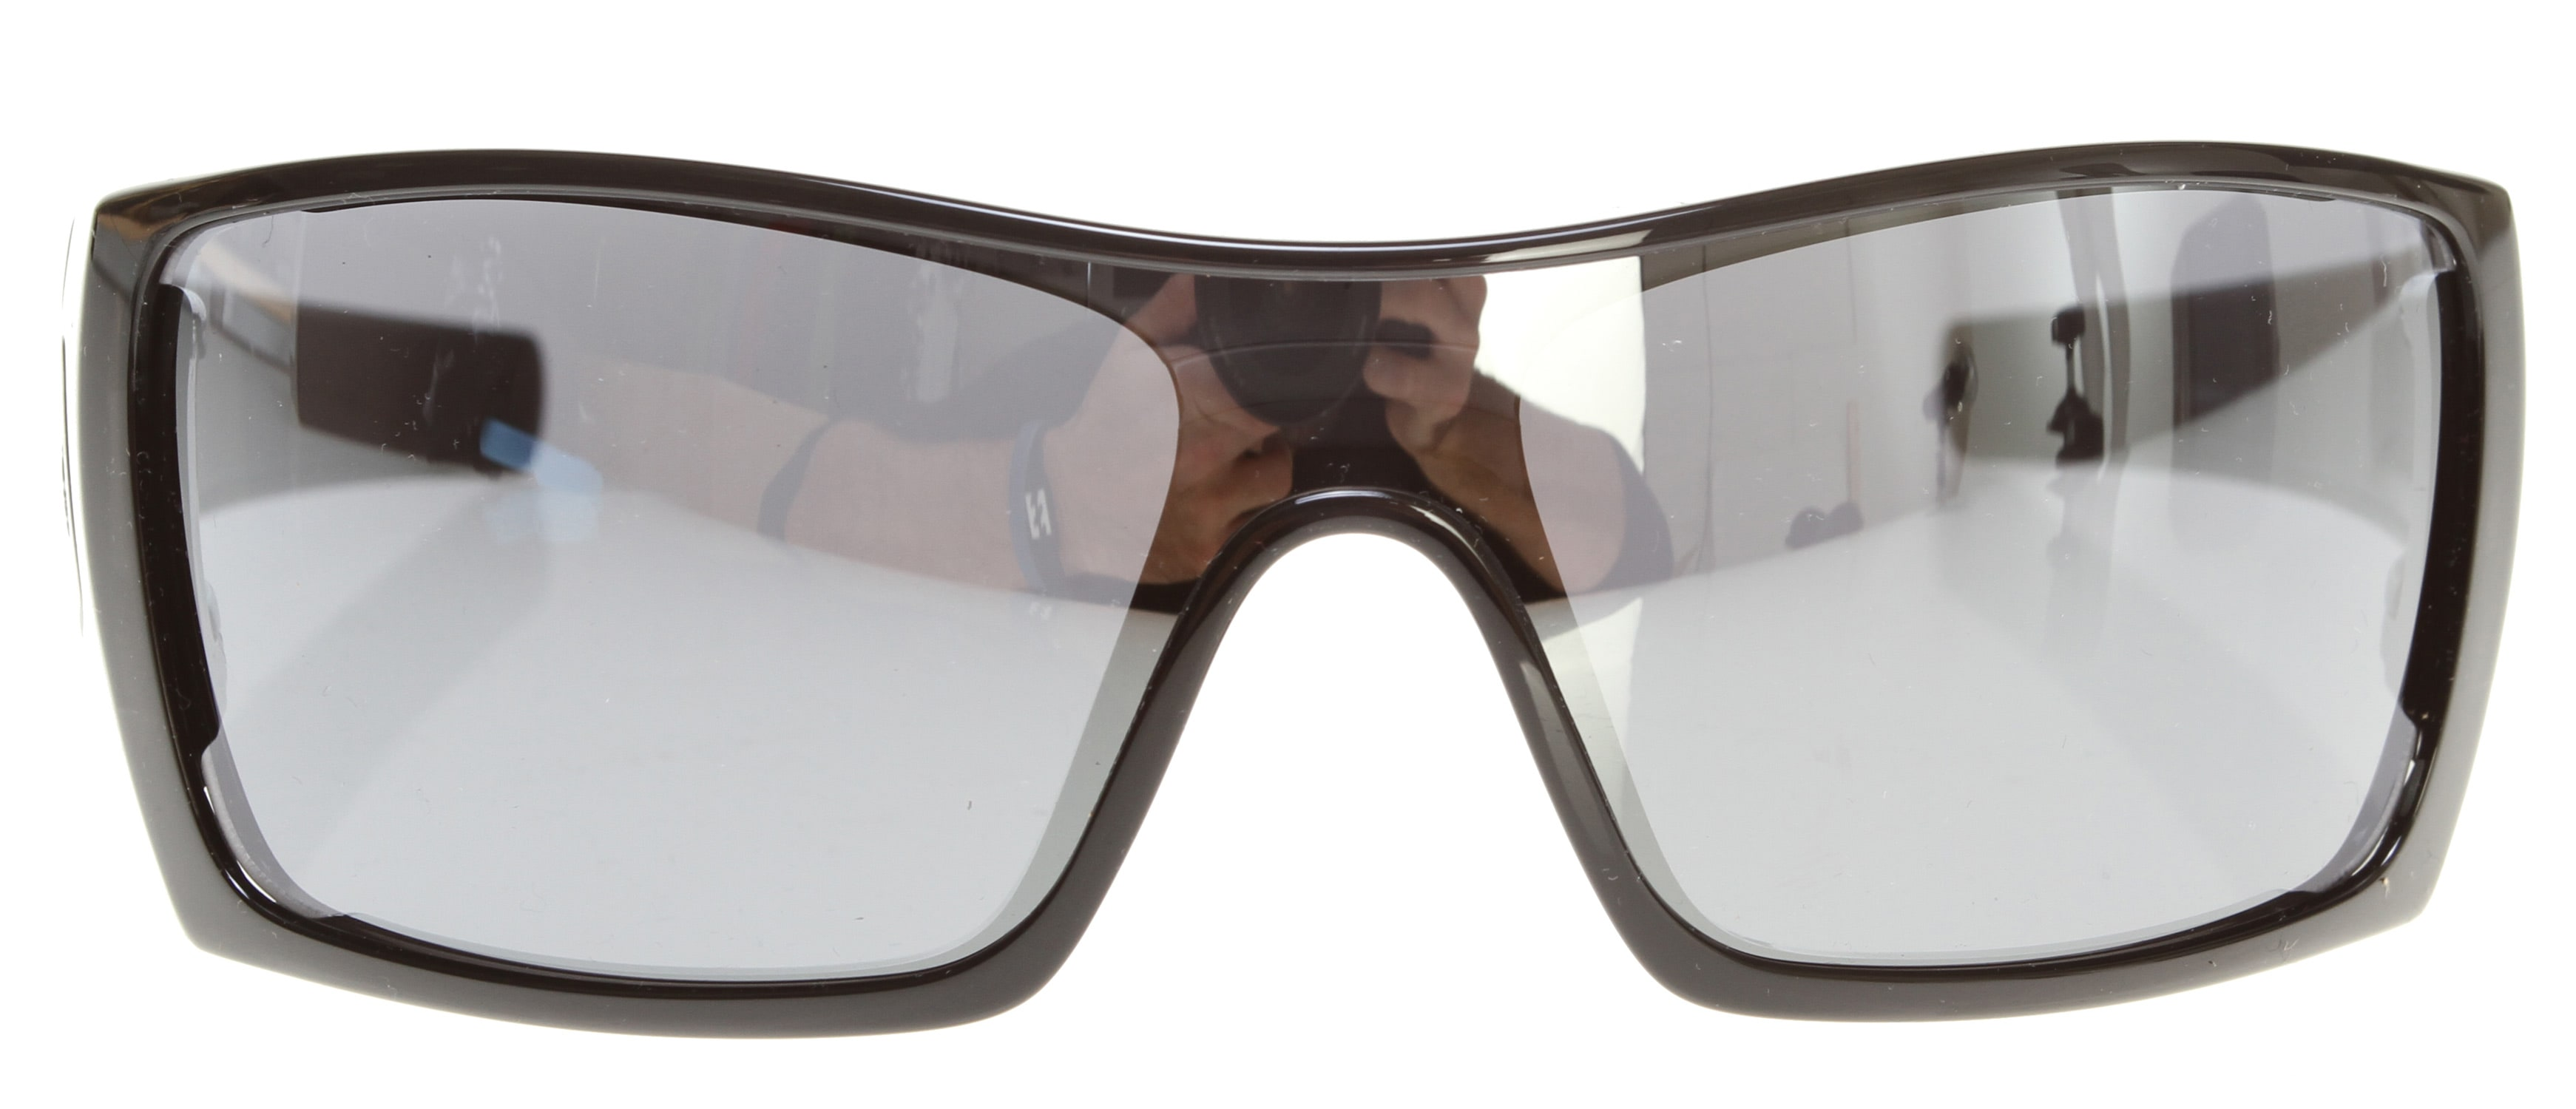 9dd4fb7e88972 Oakley Batwolf Sunglasses - thumbnail 3